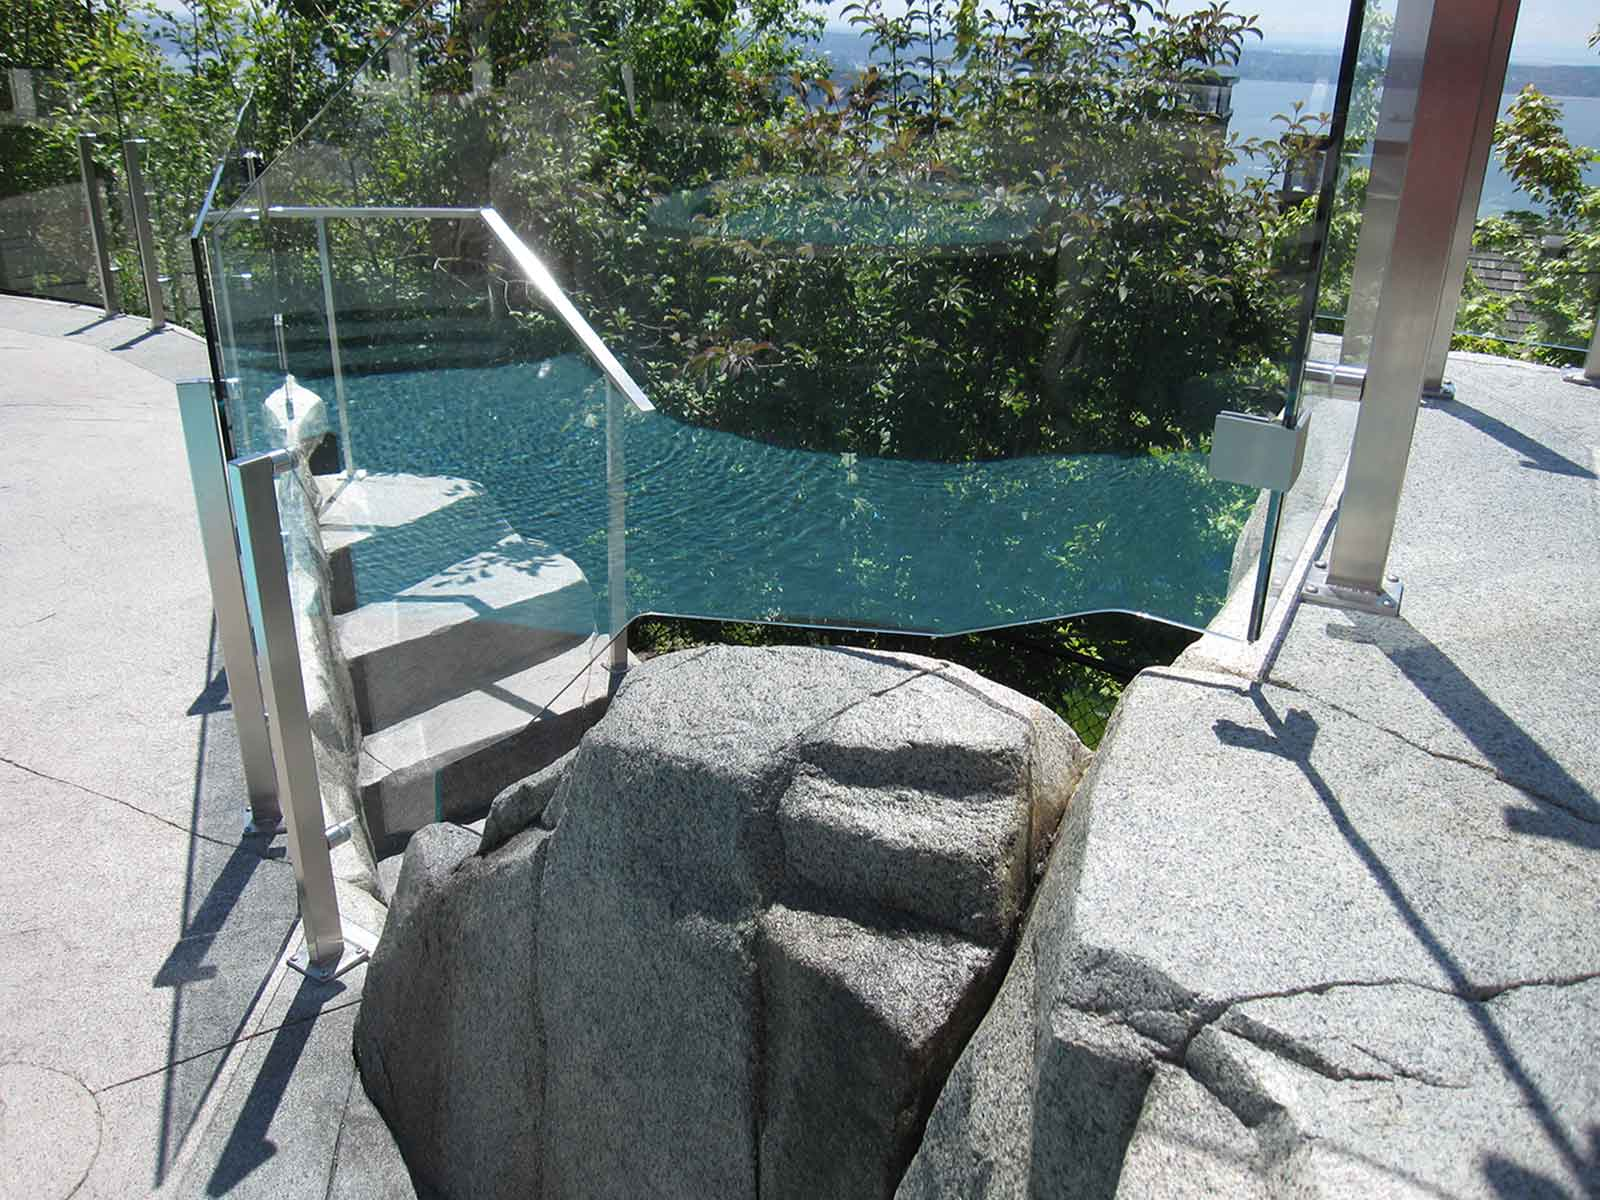 Custom concrete work in spacious backyard